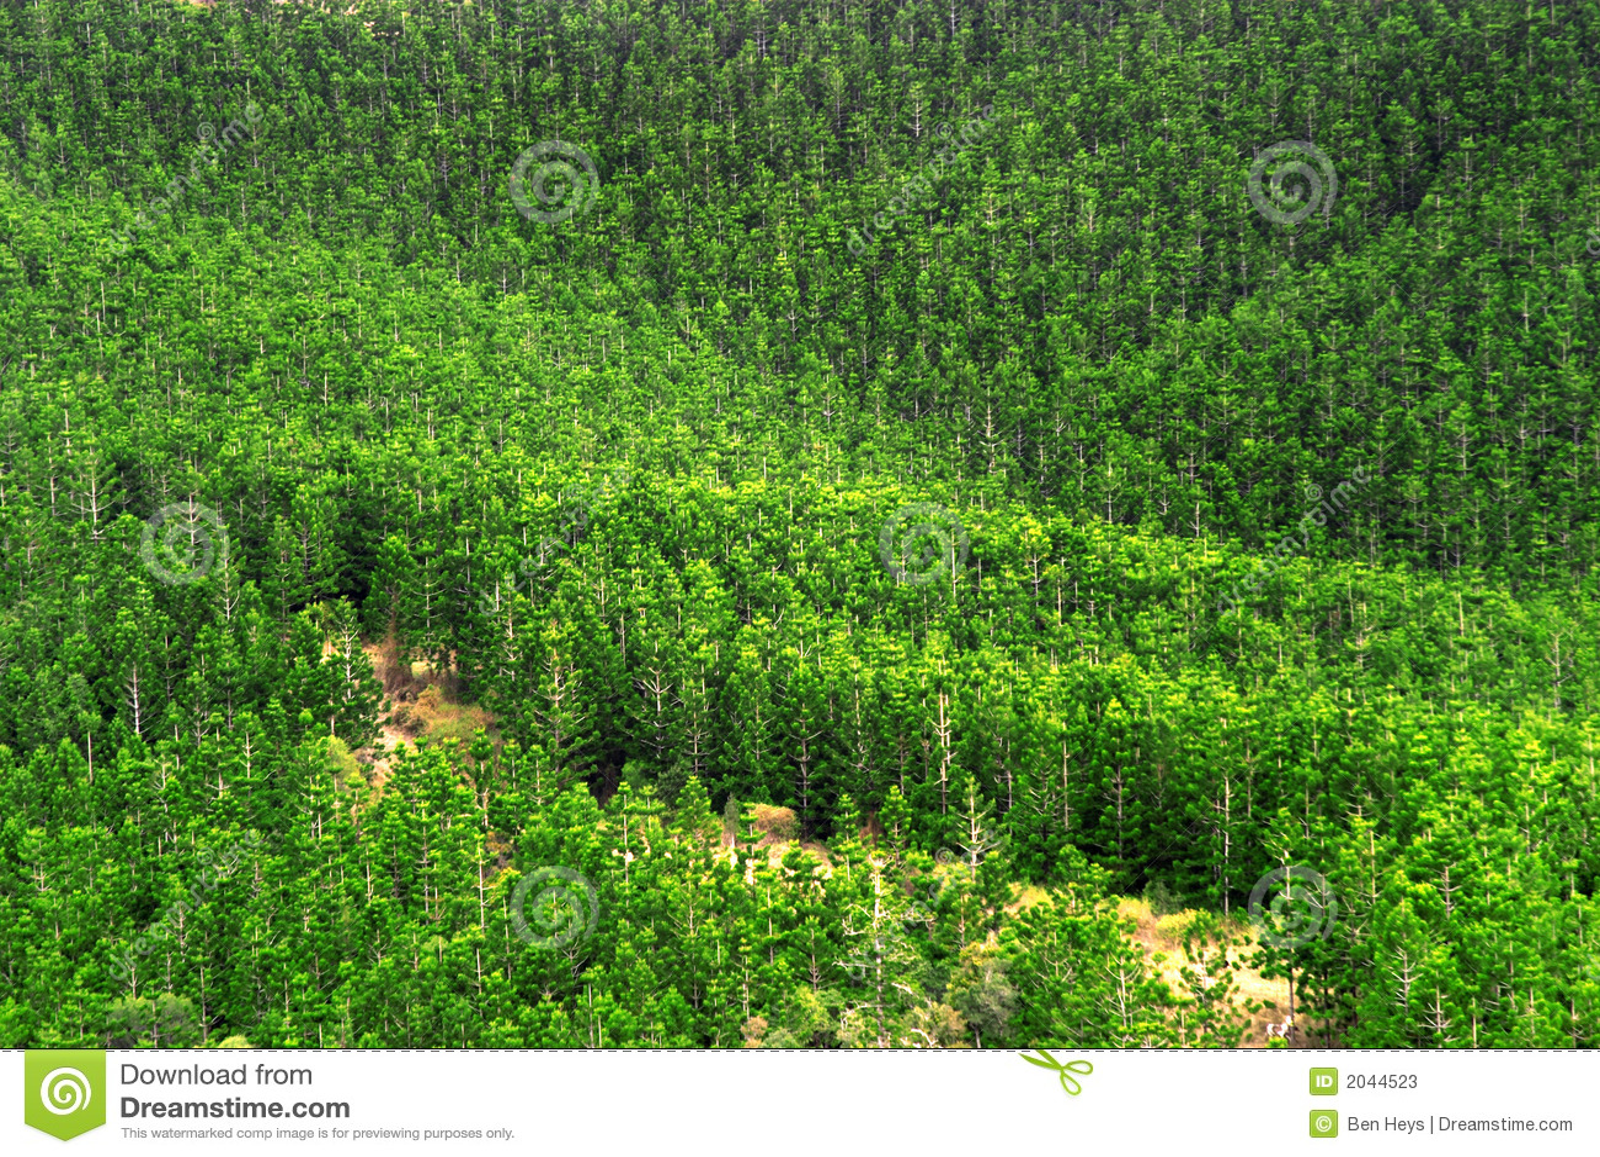 Pine Lumber Wood Shafts From Merlin Archery Ltd Wood